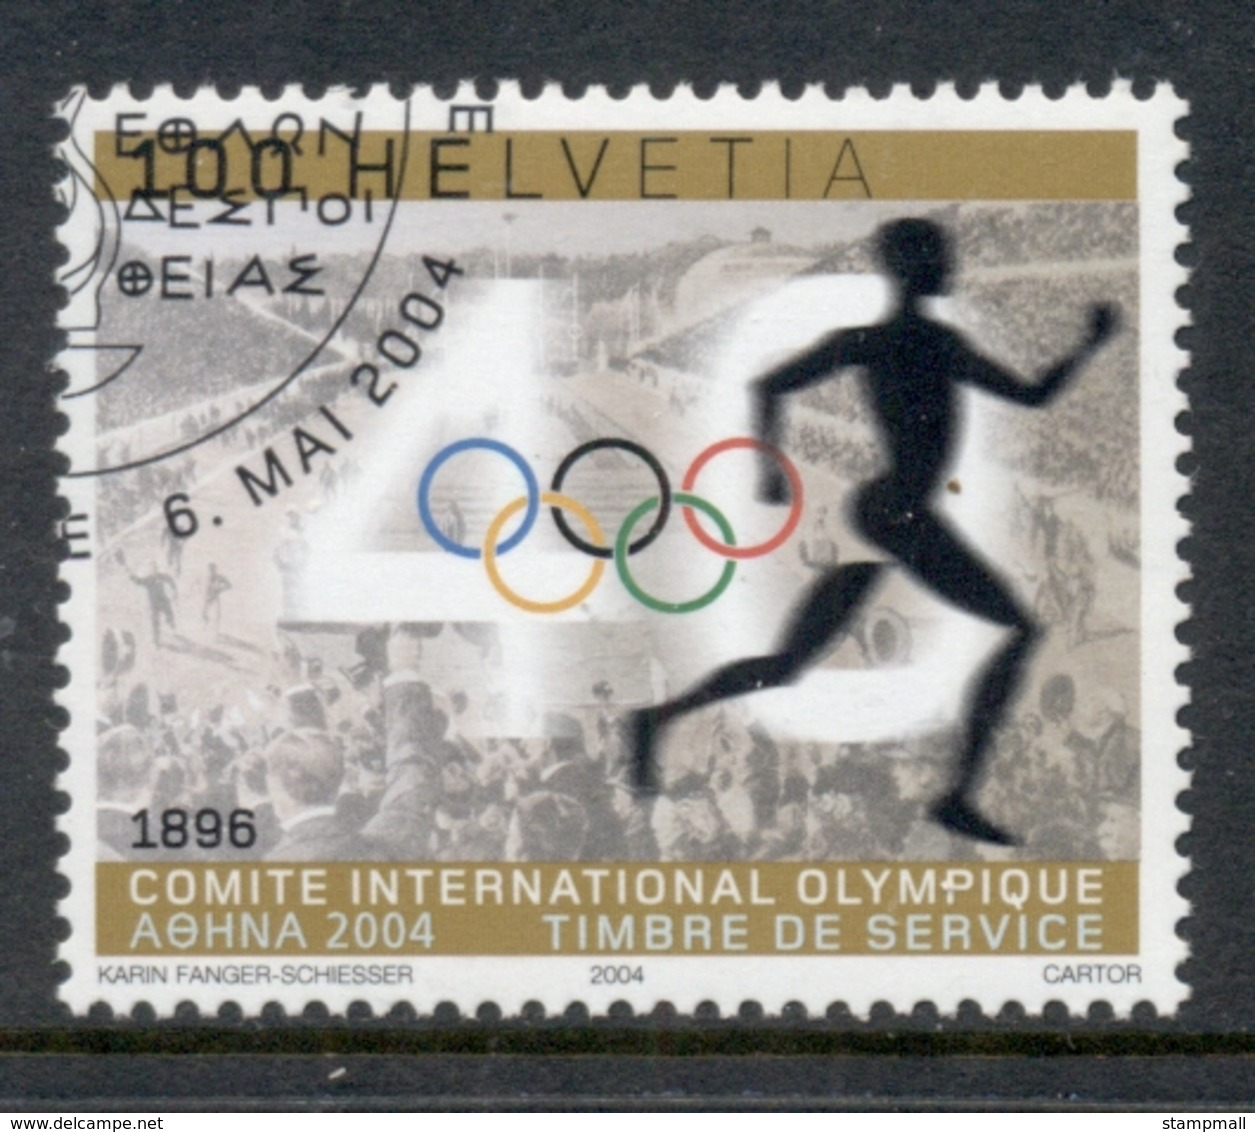 Switzerland 2004 Olympic Committee CTO - Unused Stamps